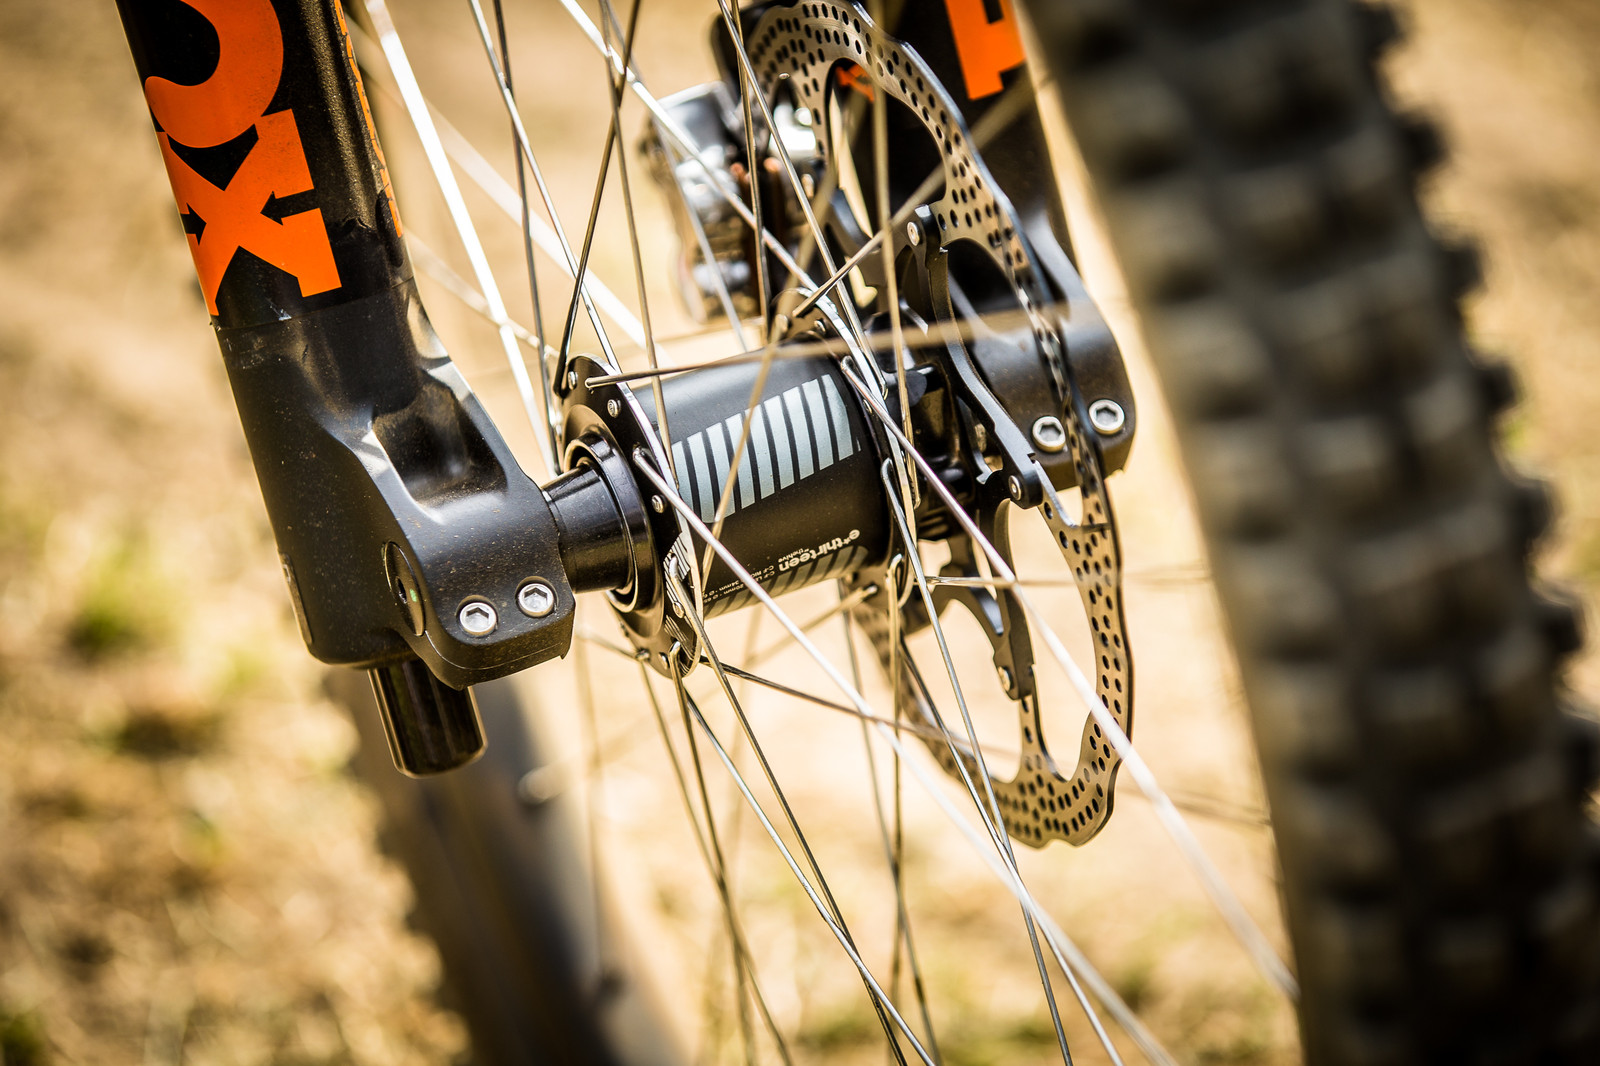 e*thirteen LG1r Wheels - WINNING BIKE: Aaron Gwin's YT TUES - Mountain Biking Pictures - Vital MTB